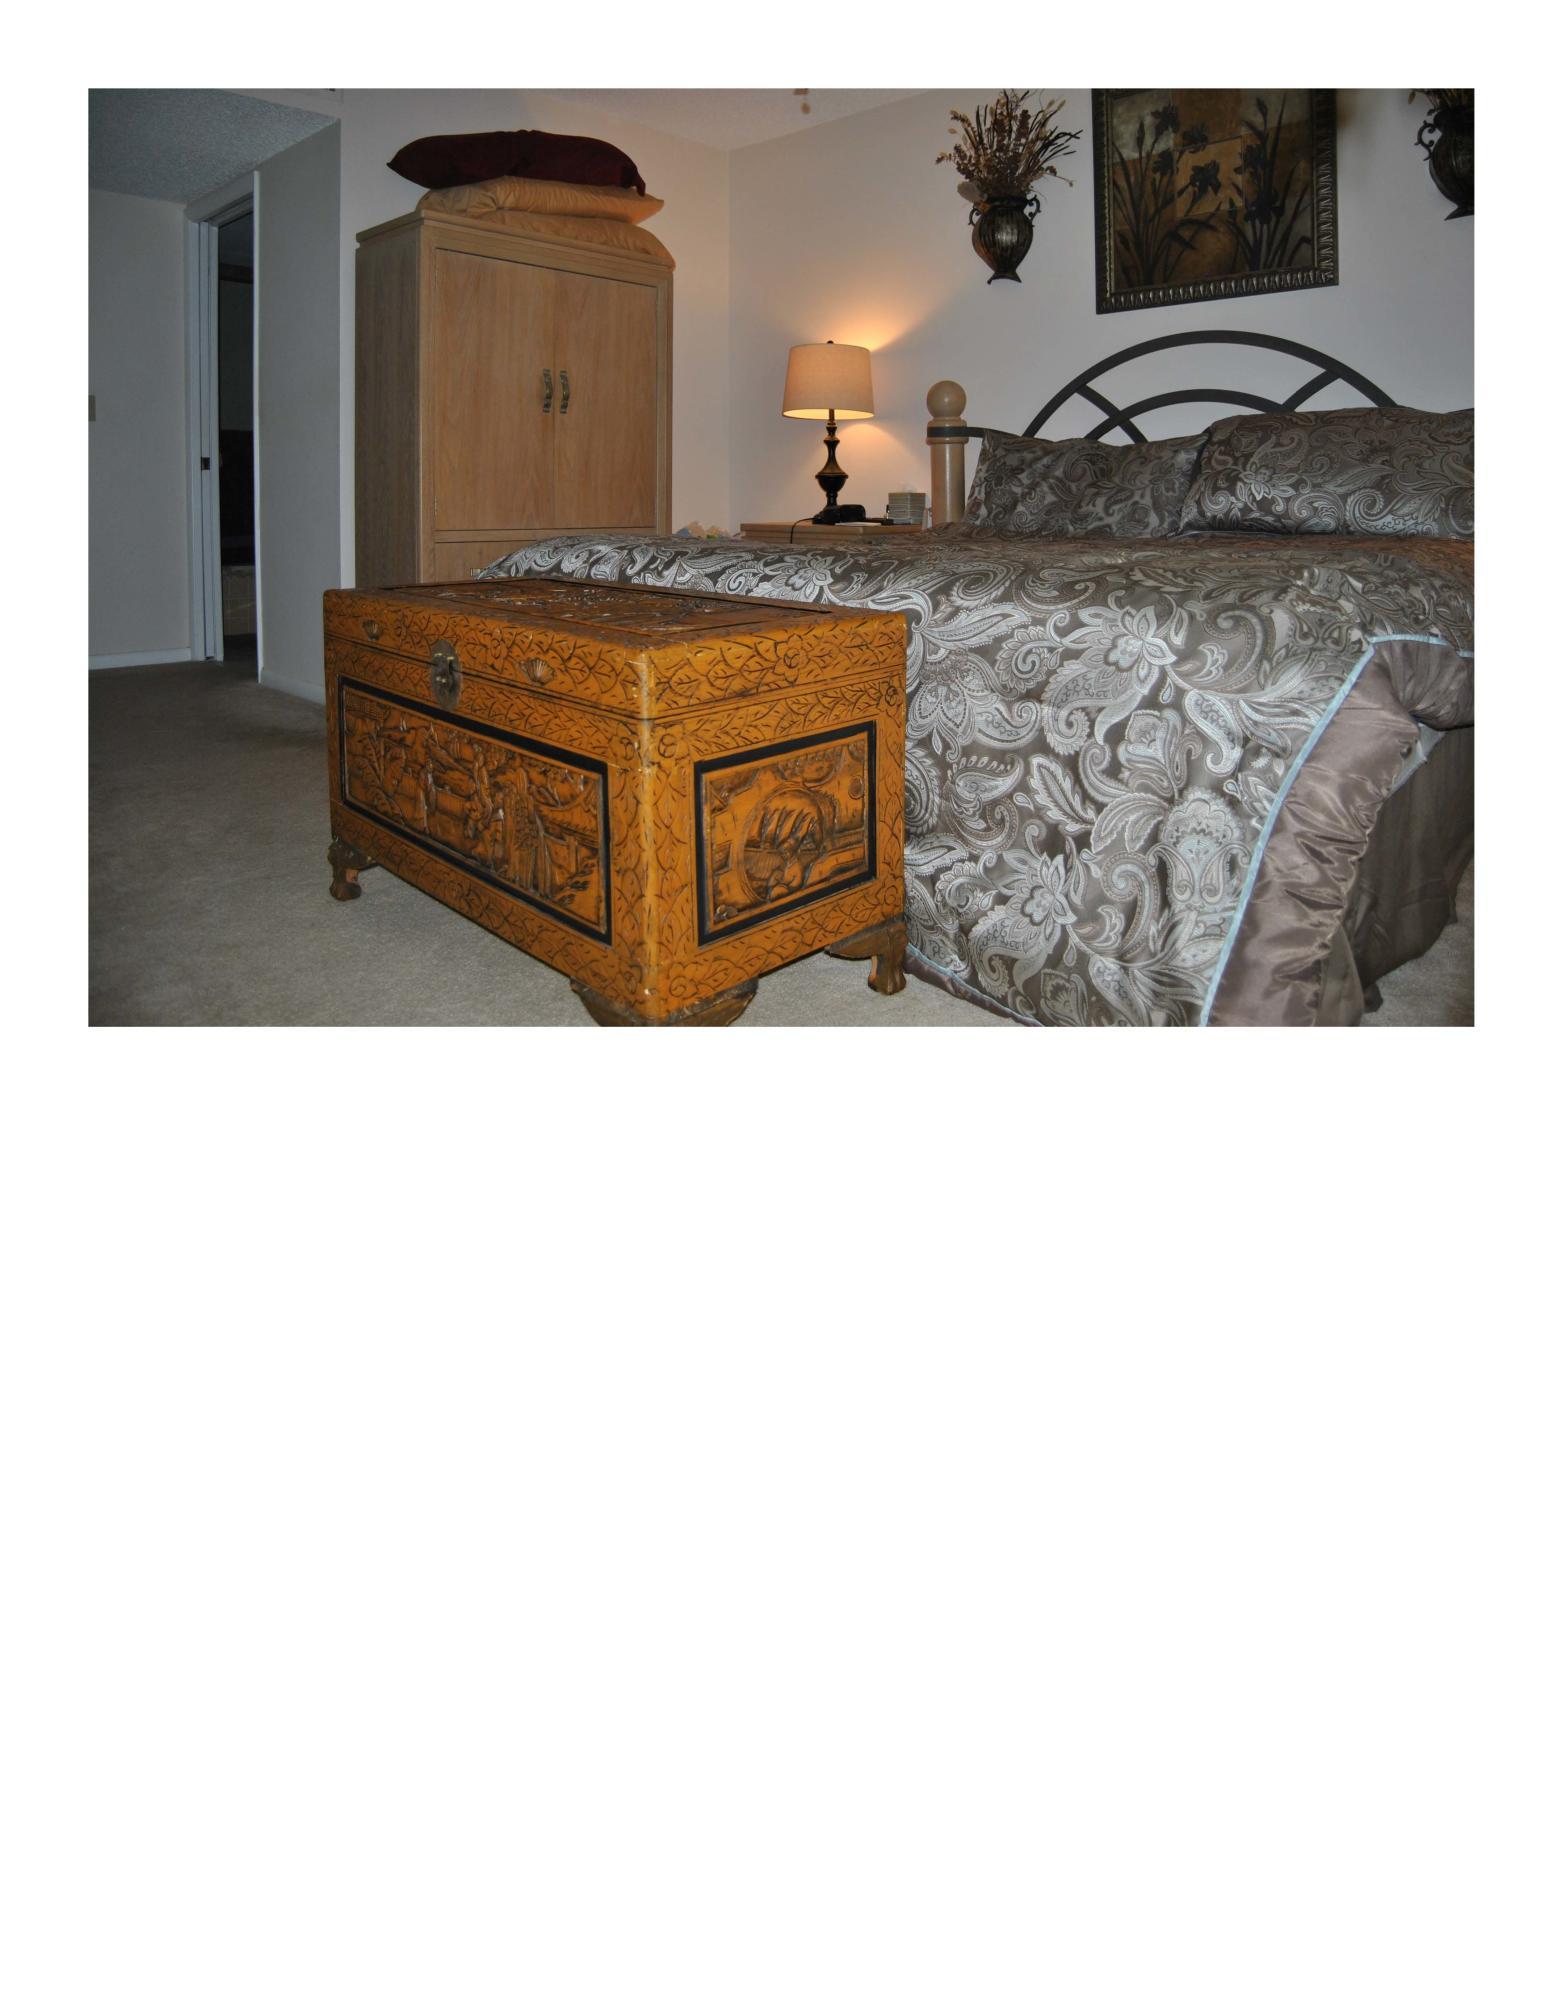 5757 Fairway Park Court 103 Boynton Beach, FL 33437 photo 17